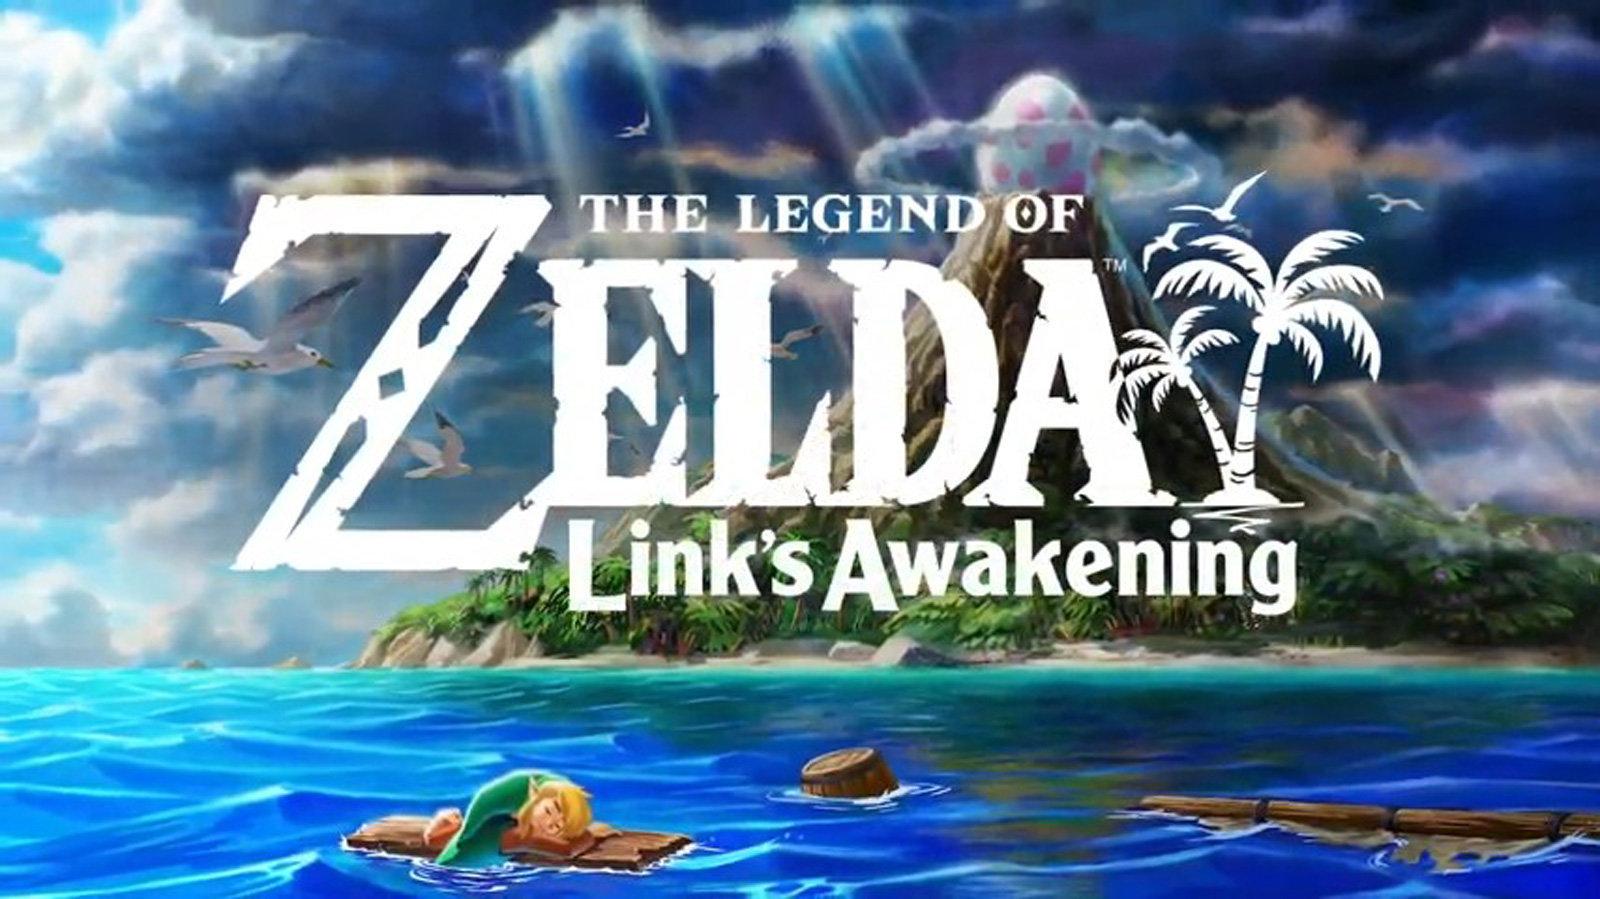 The Legend of Zelda: Link's Awakening Remake - Nintendo Direct E3